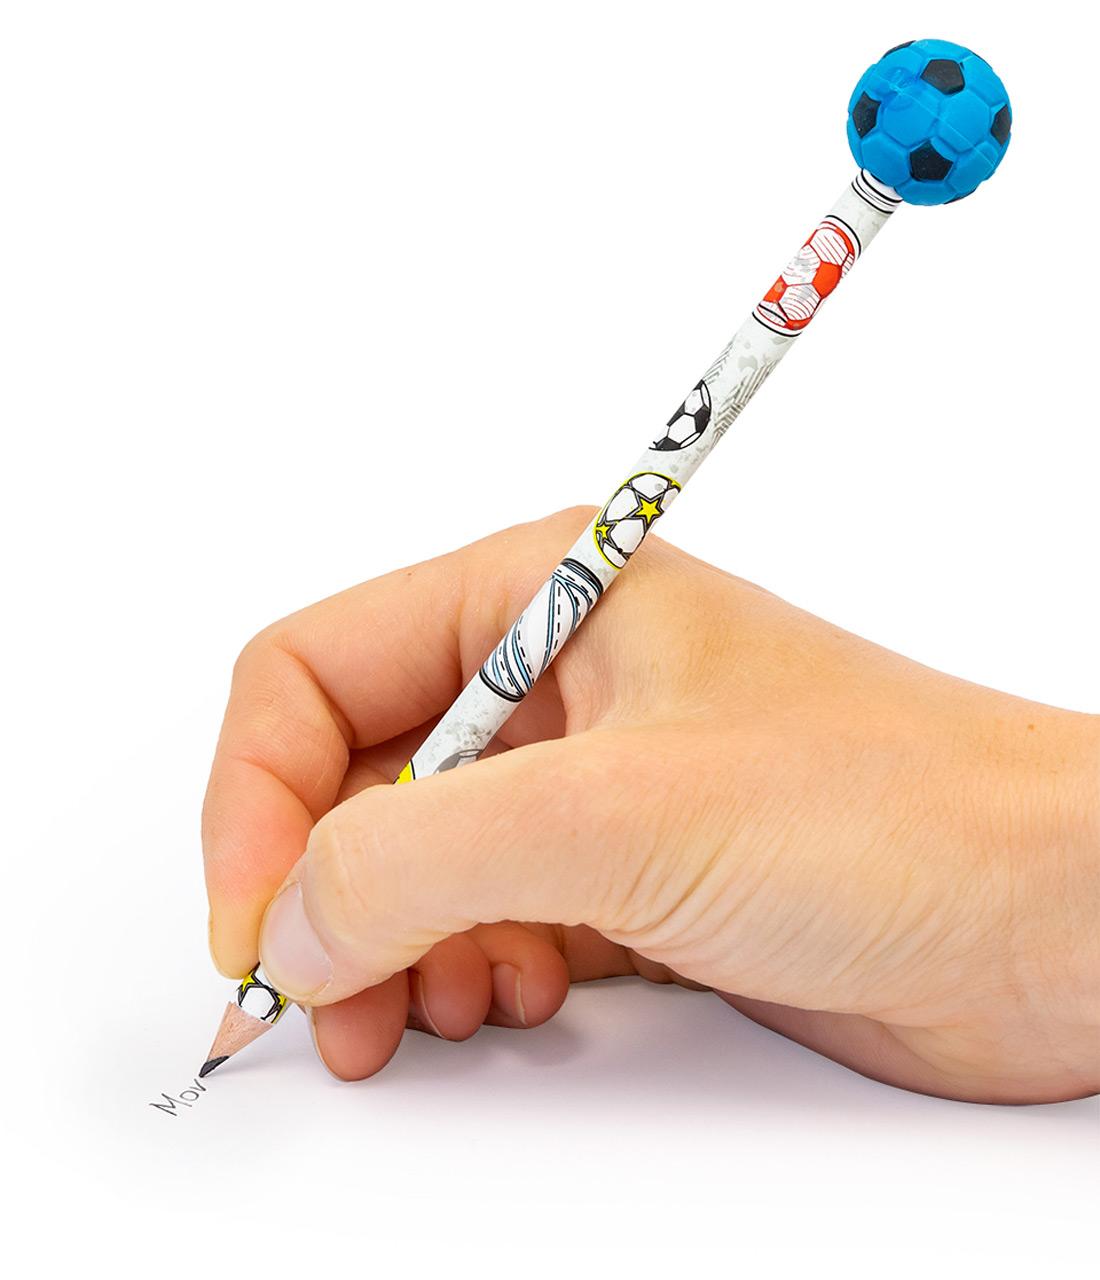 Stiftbeschwerer-Fussball-inkl-Bleistift-Anwendung-beim-schreiben-lafueliki